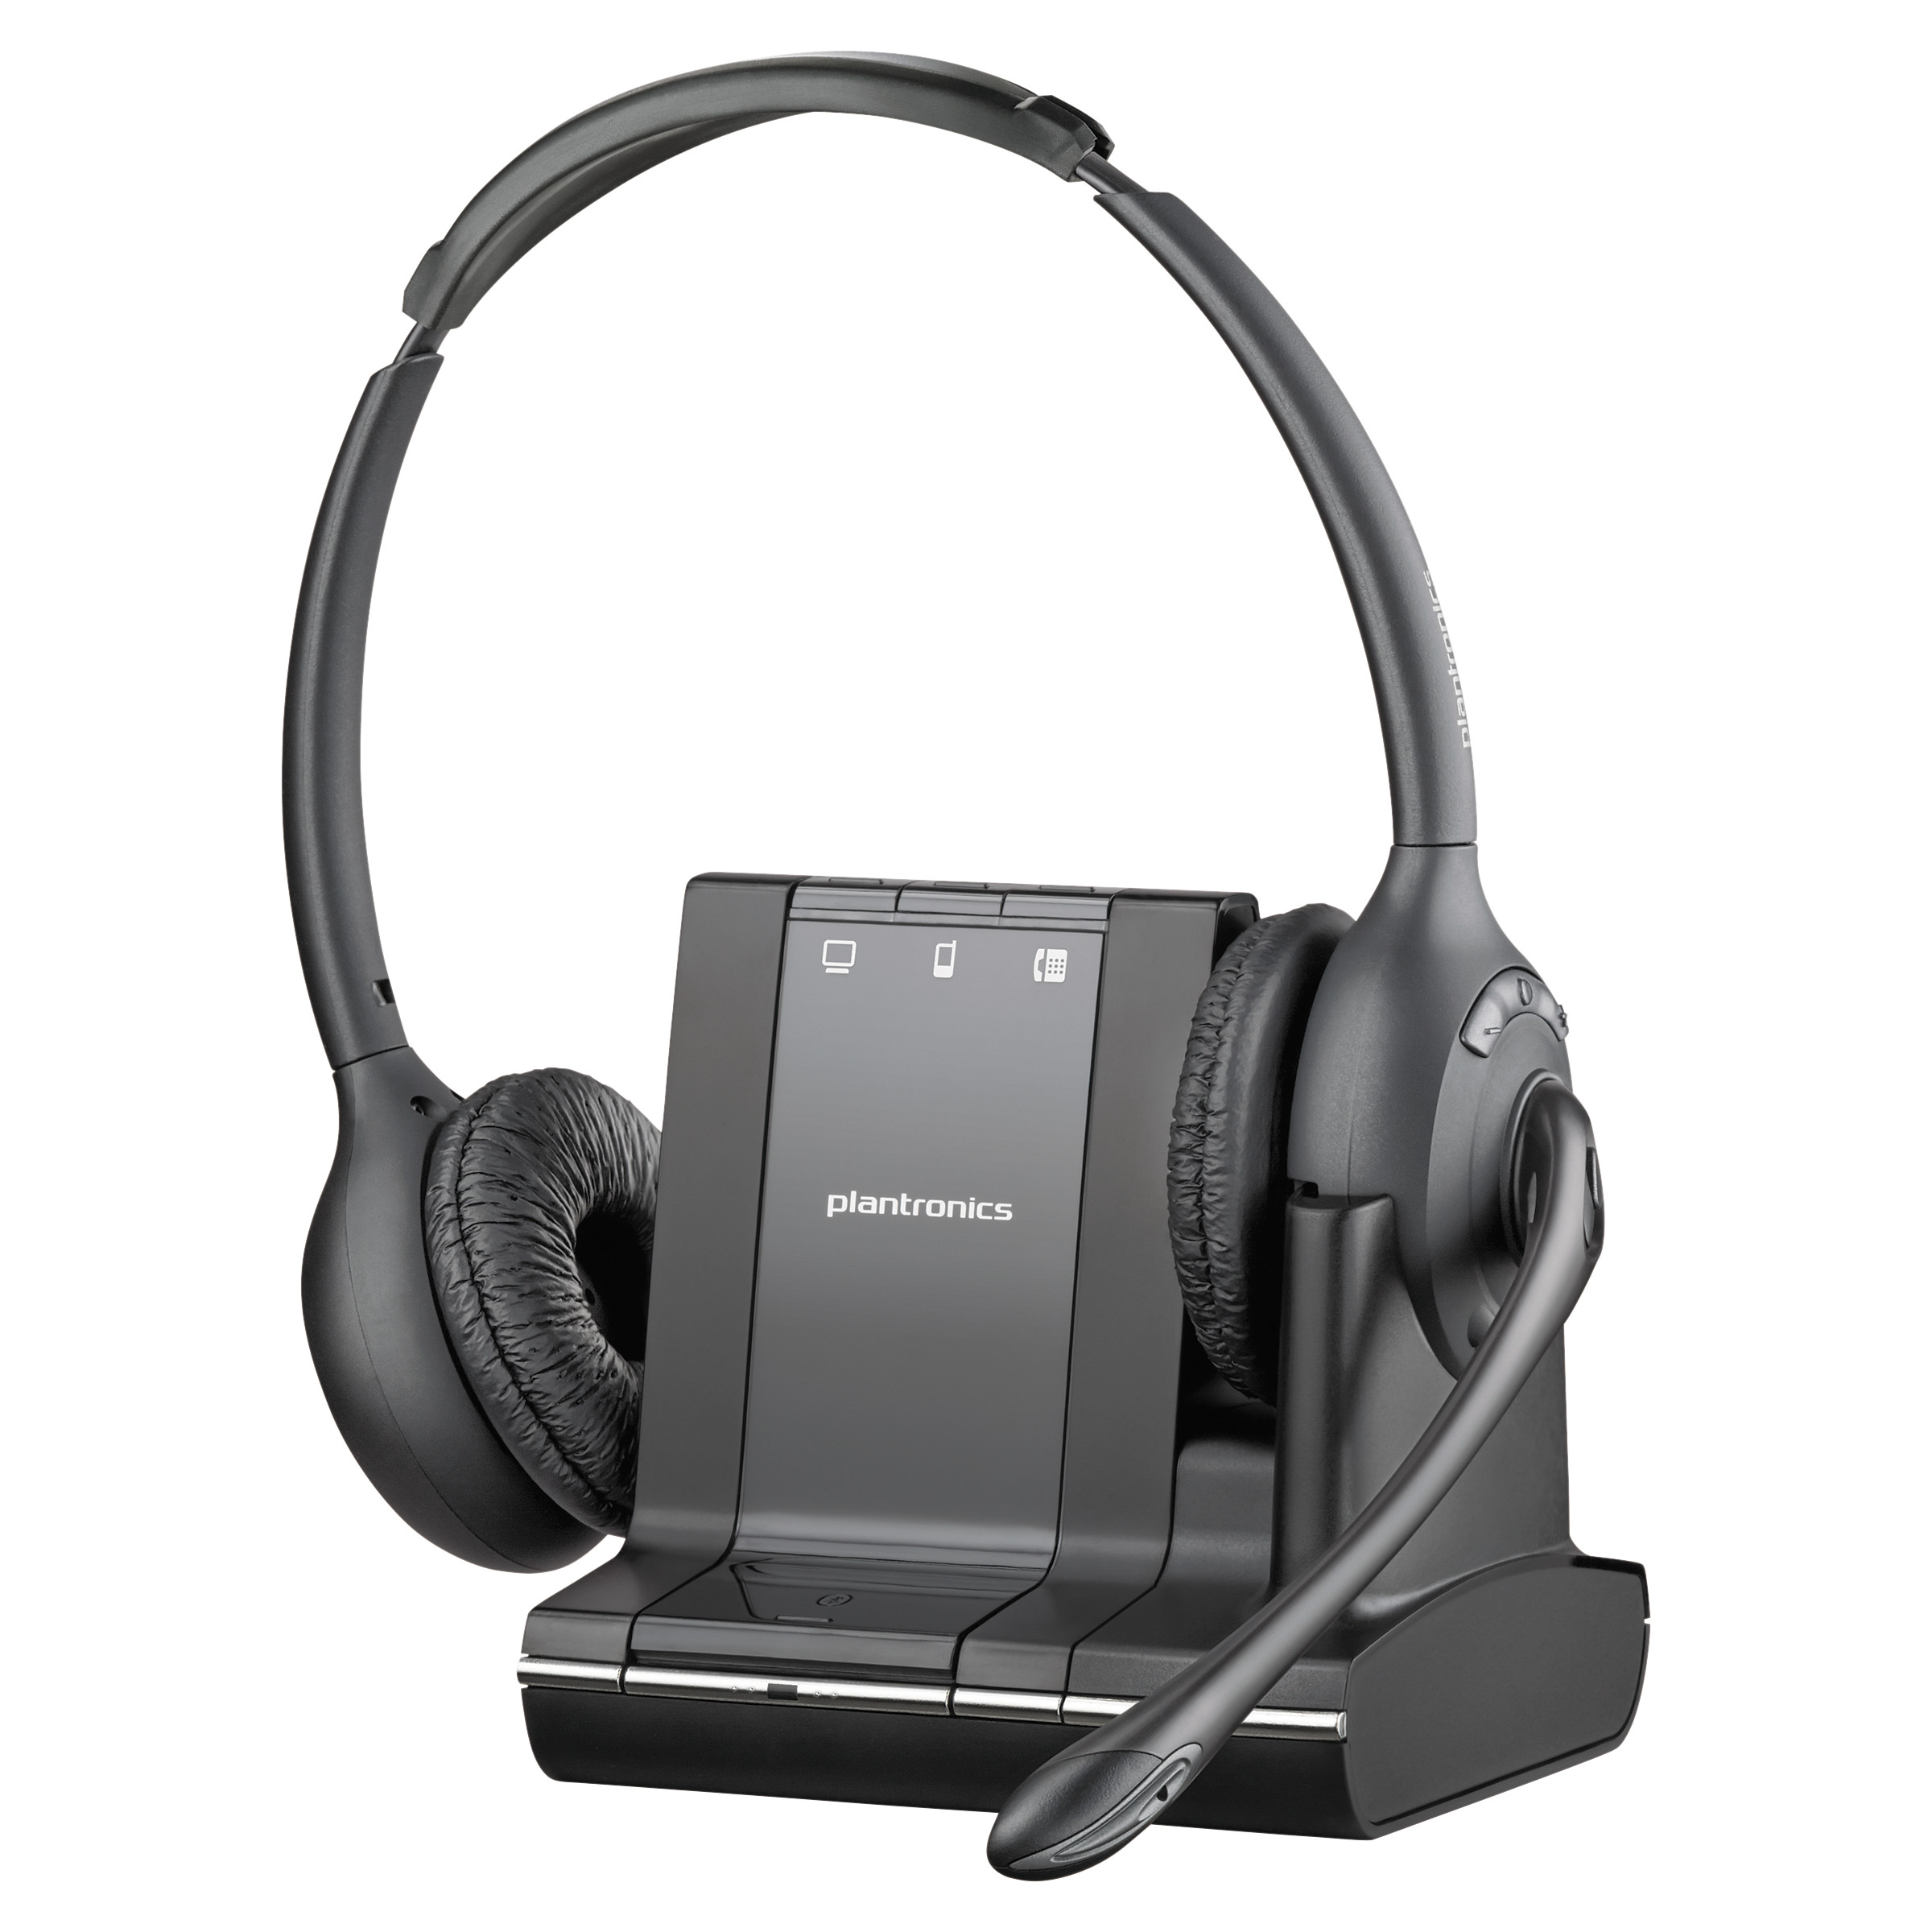 Plantronics Savi 720 Binaural Over-the-Head Headset